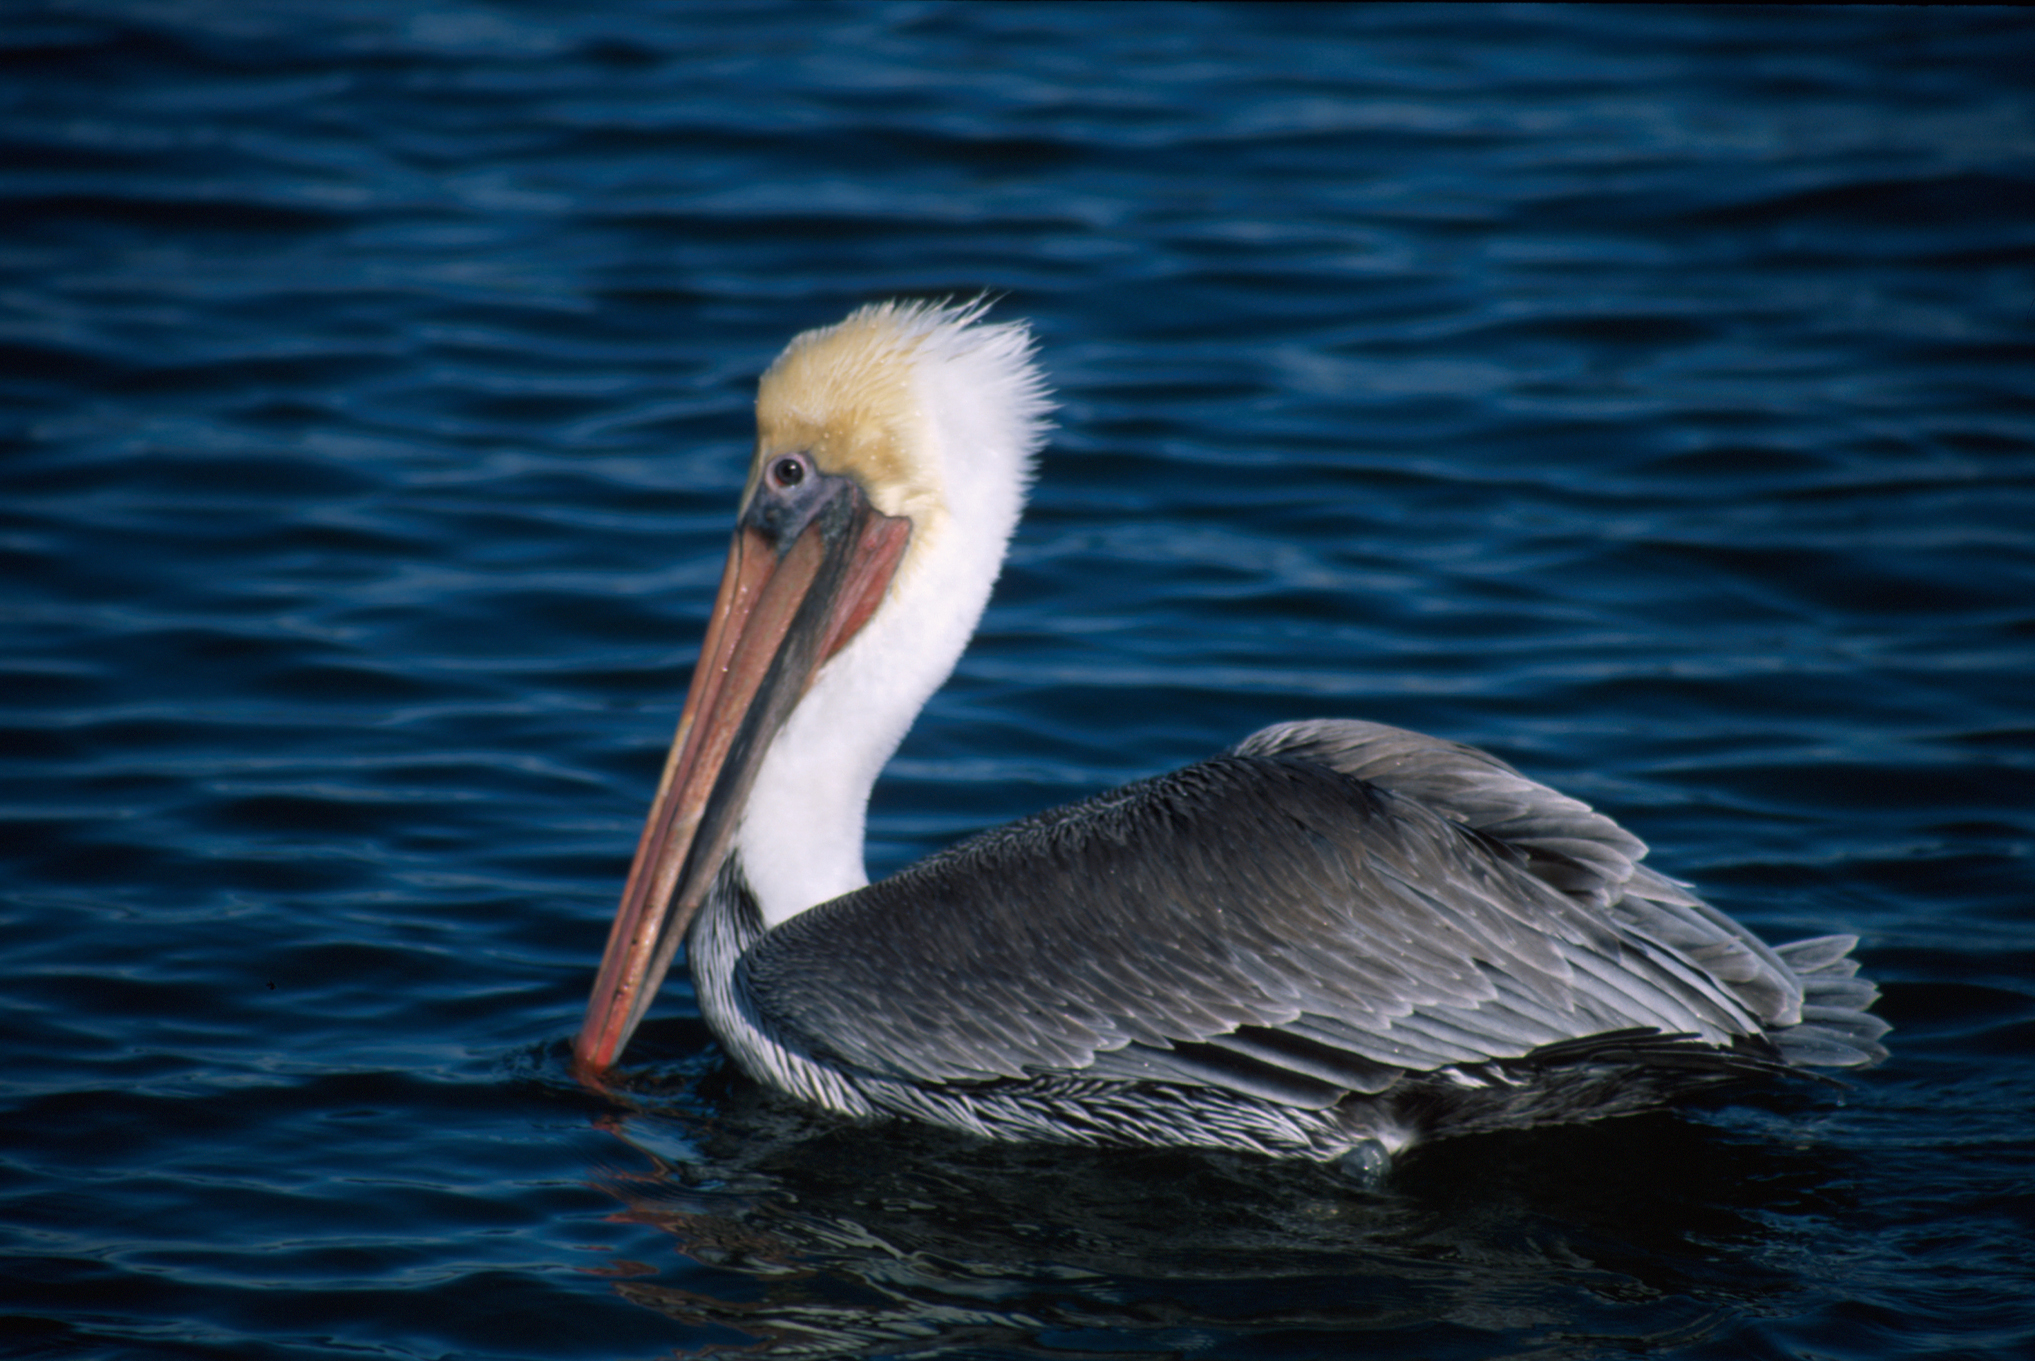 National Birds Of America >> File:Pelecanus occidentalis NBII.jpg - Wikimedia Commons